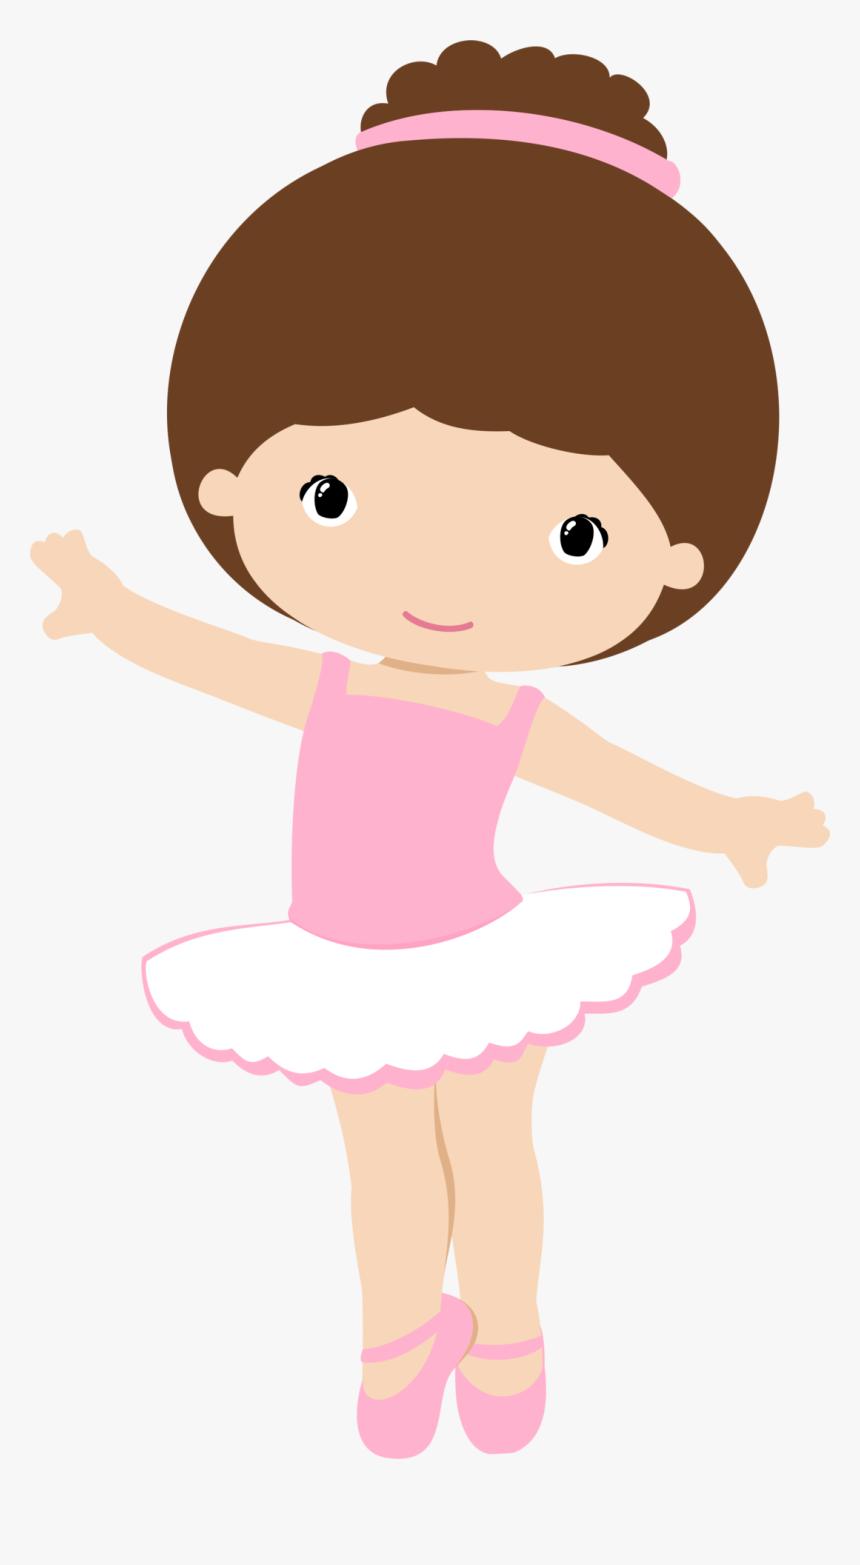 Free Ballerina Zeichnung, Download Free Clip Art, Free Clip Art on Clipart  Library